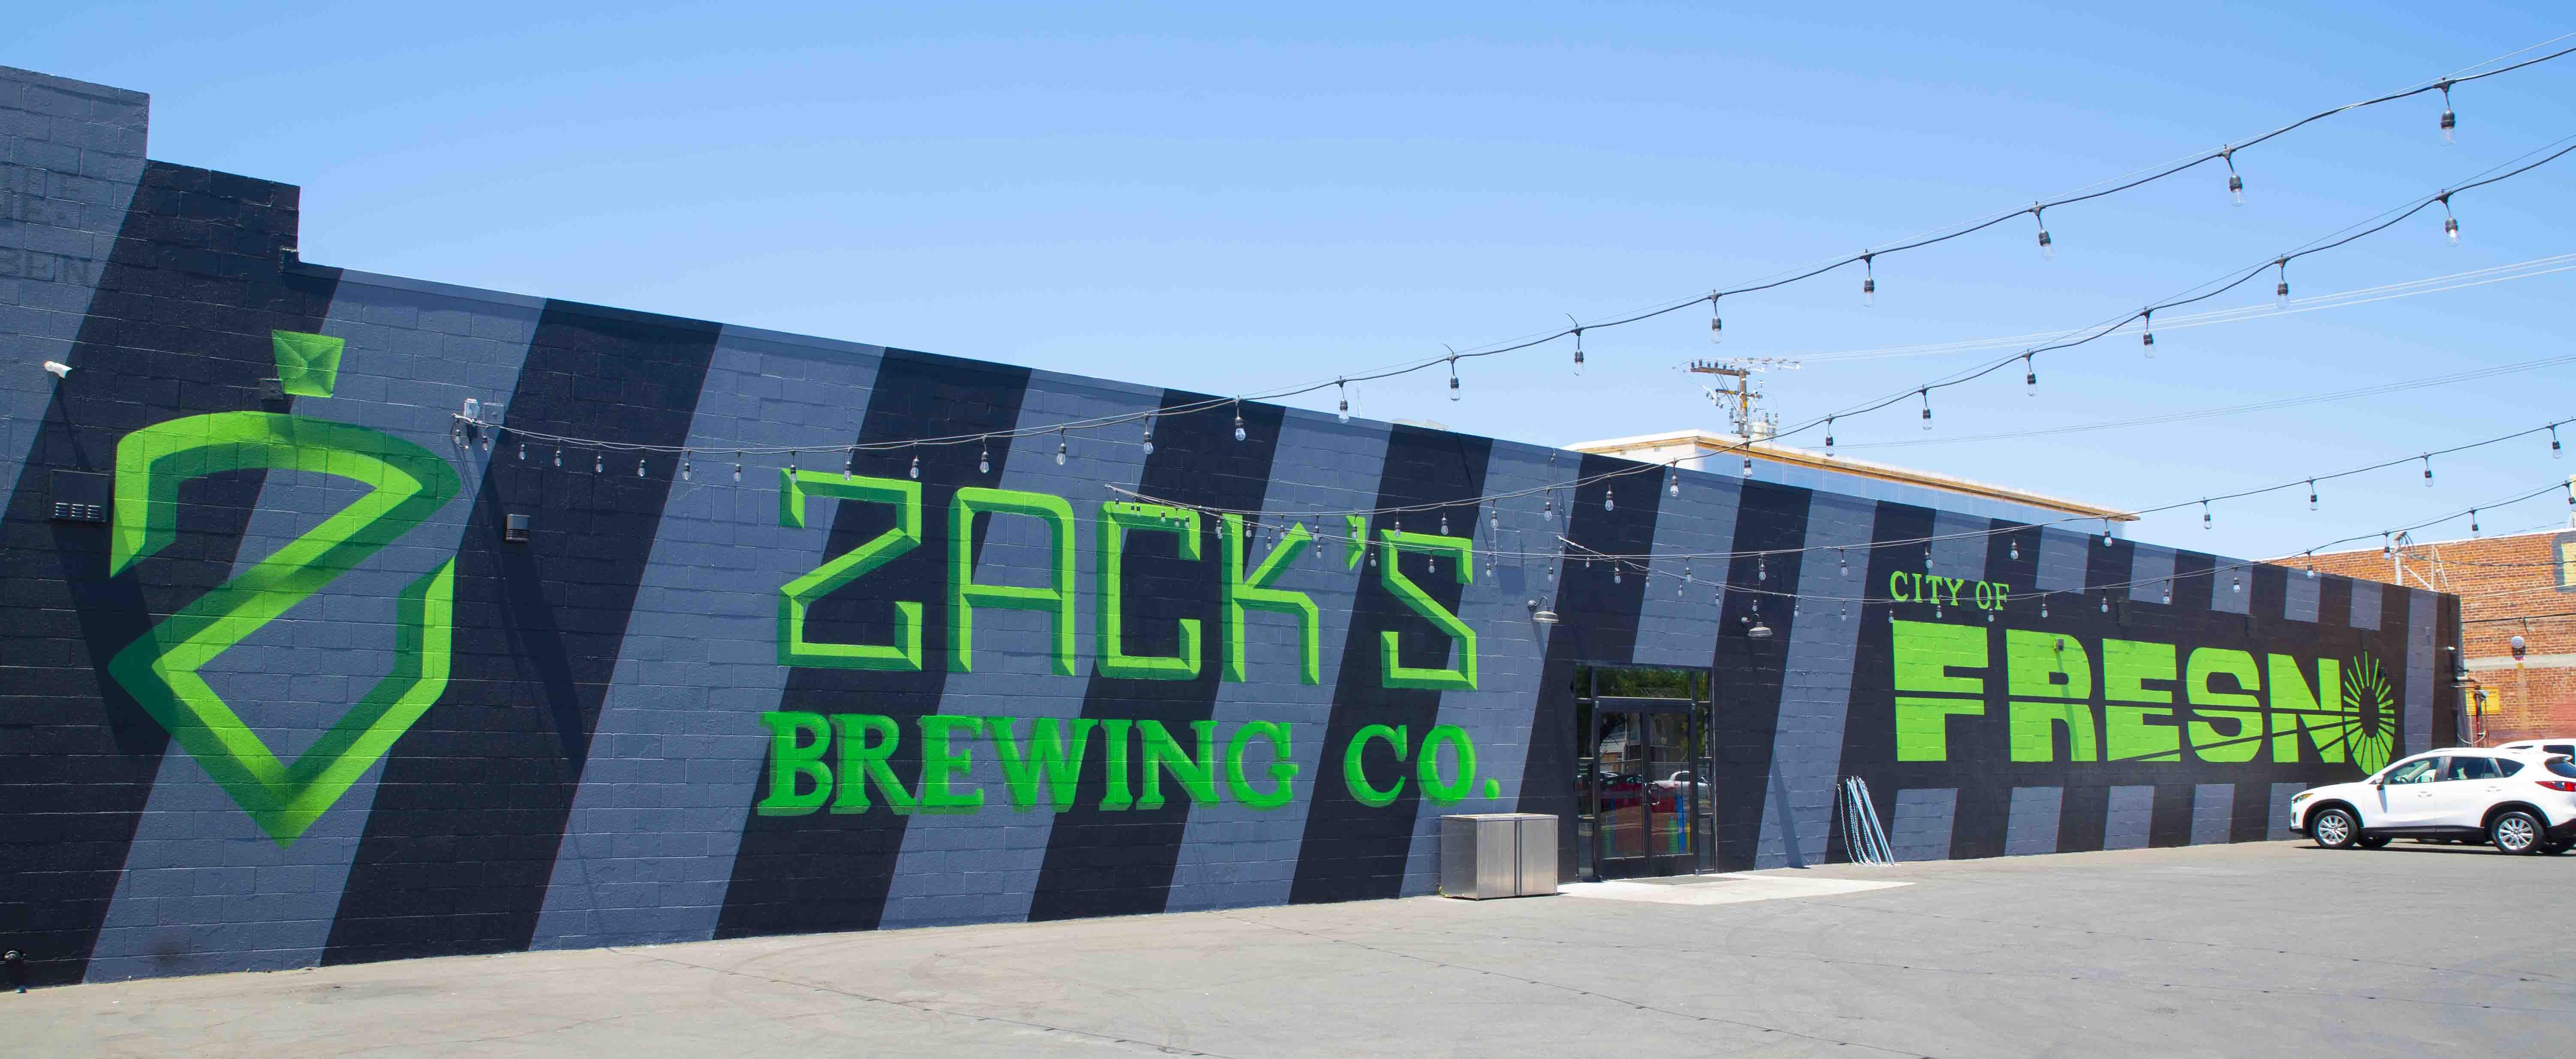 Zack's Brewing Company Mural